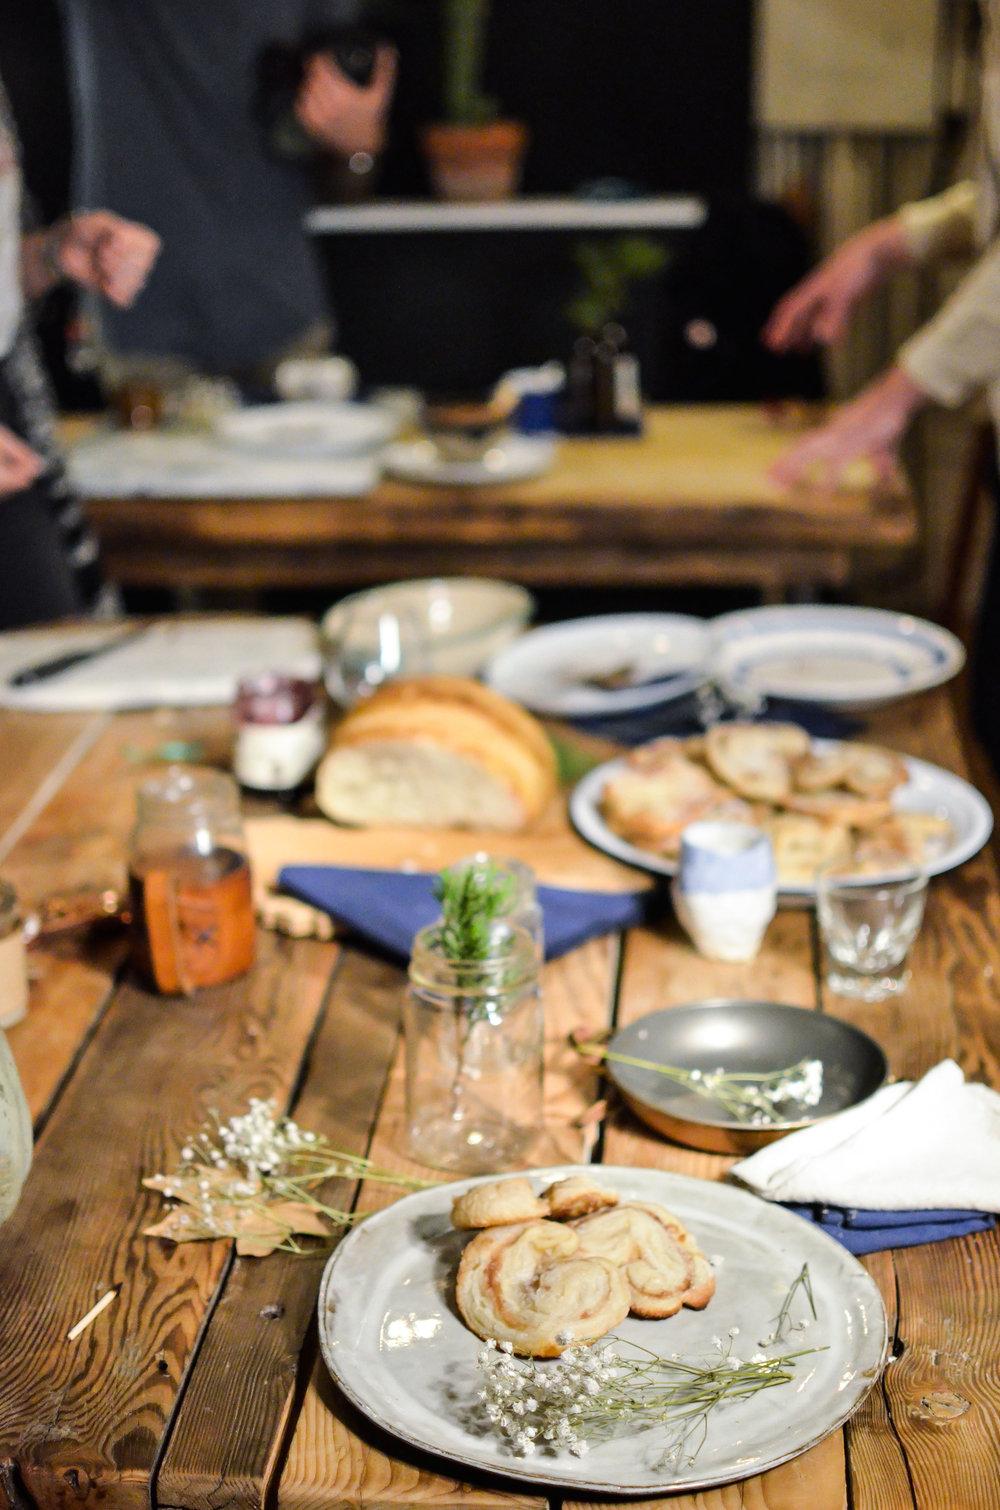 Wendling_Boyd_Harless_Hugh_Gathering_Food_Styling_Class-21.jpg